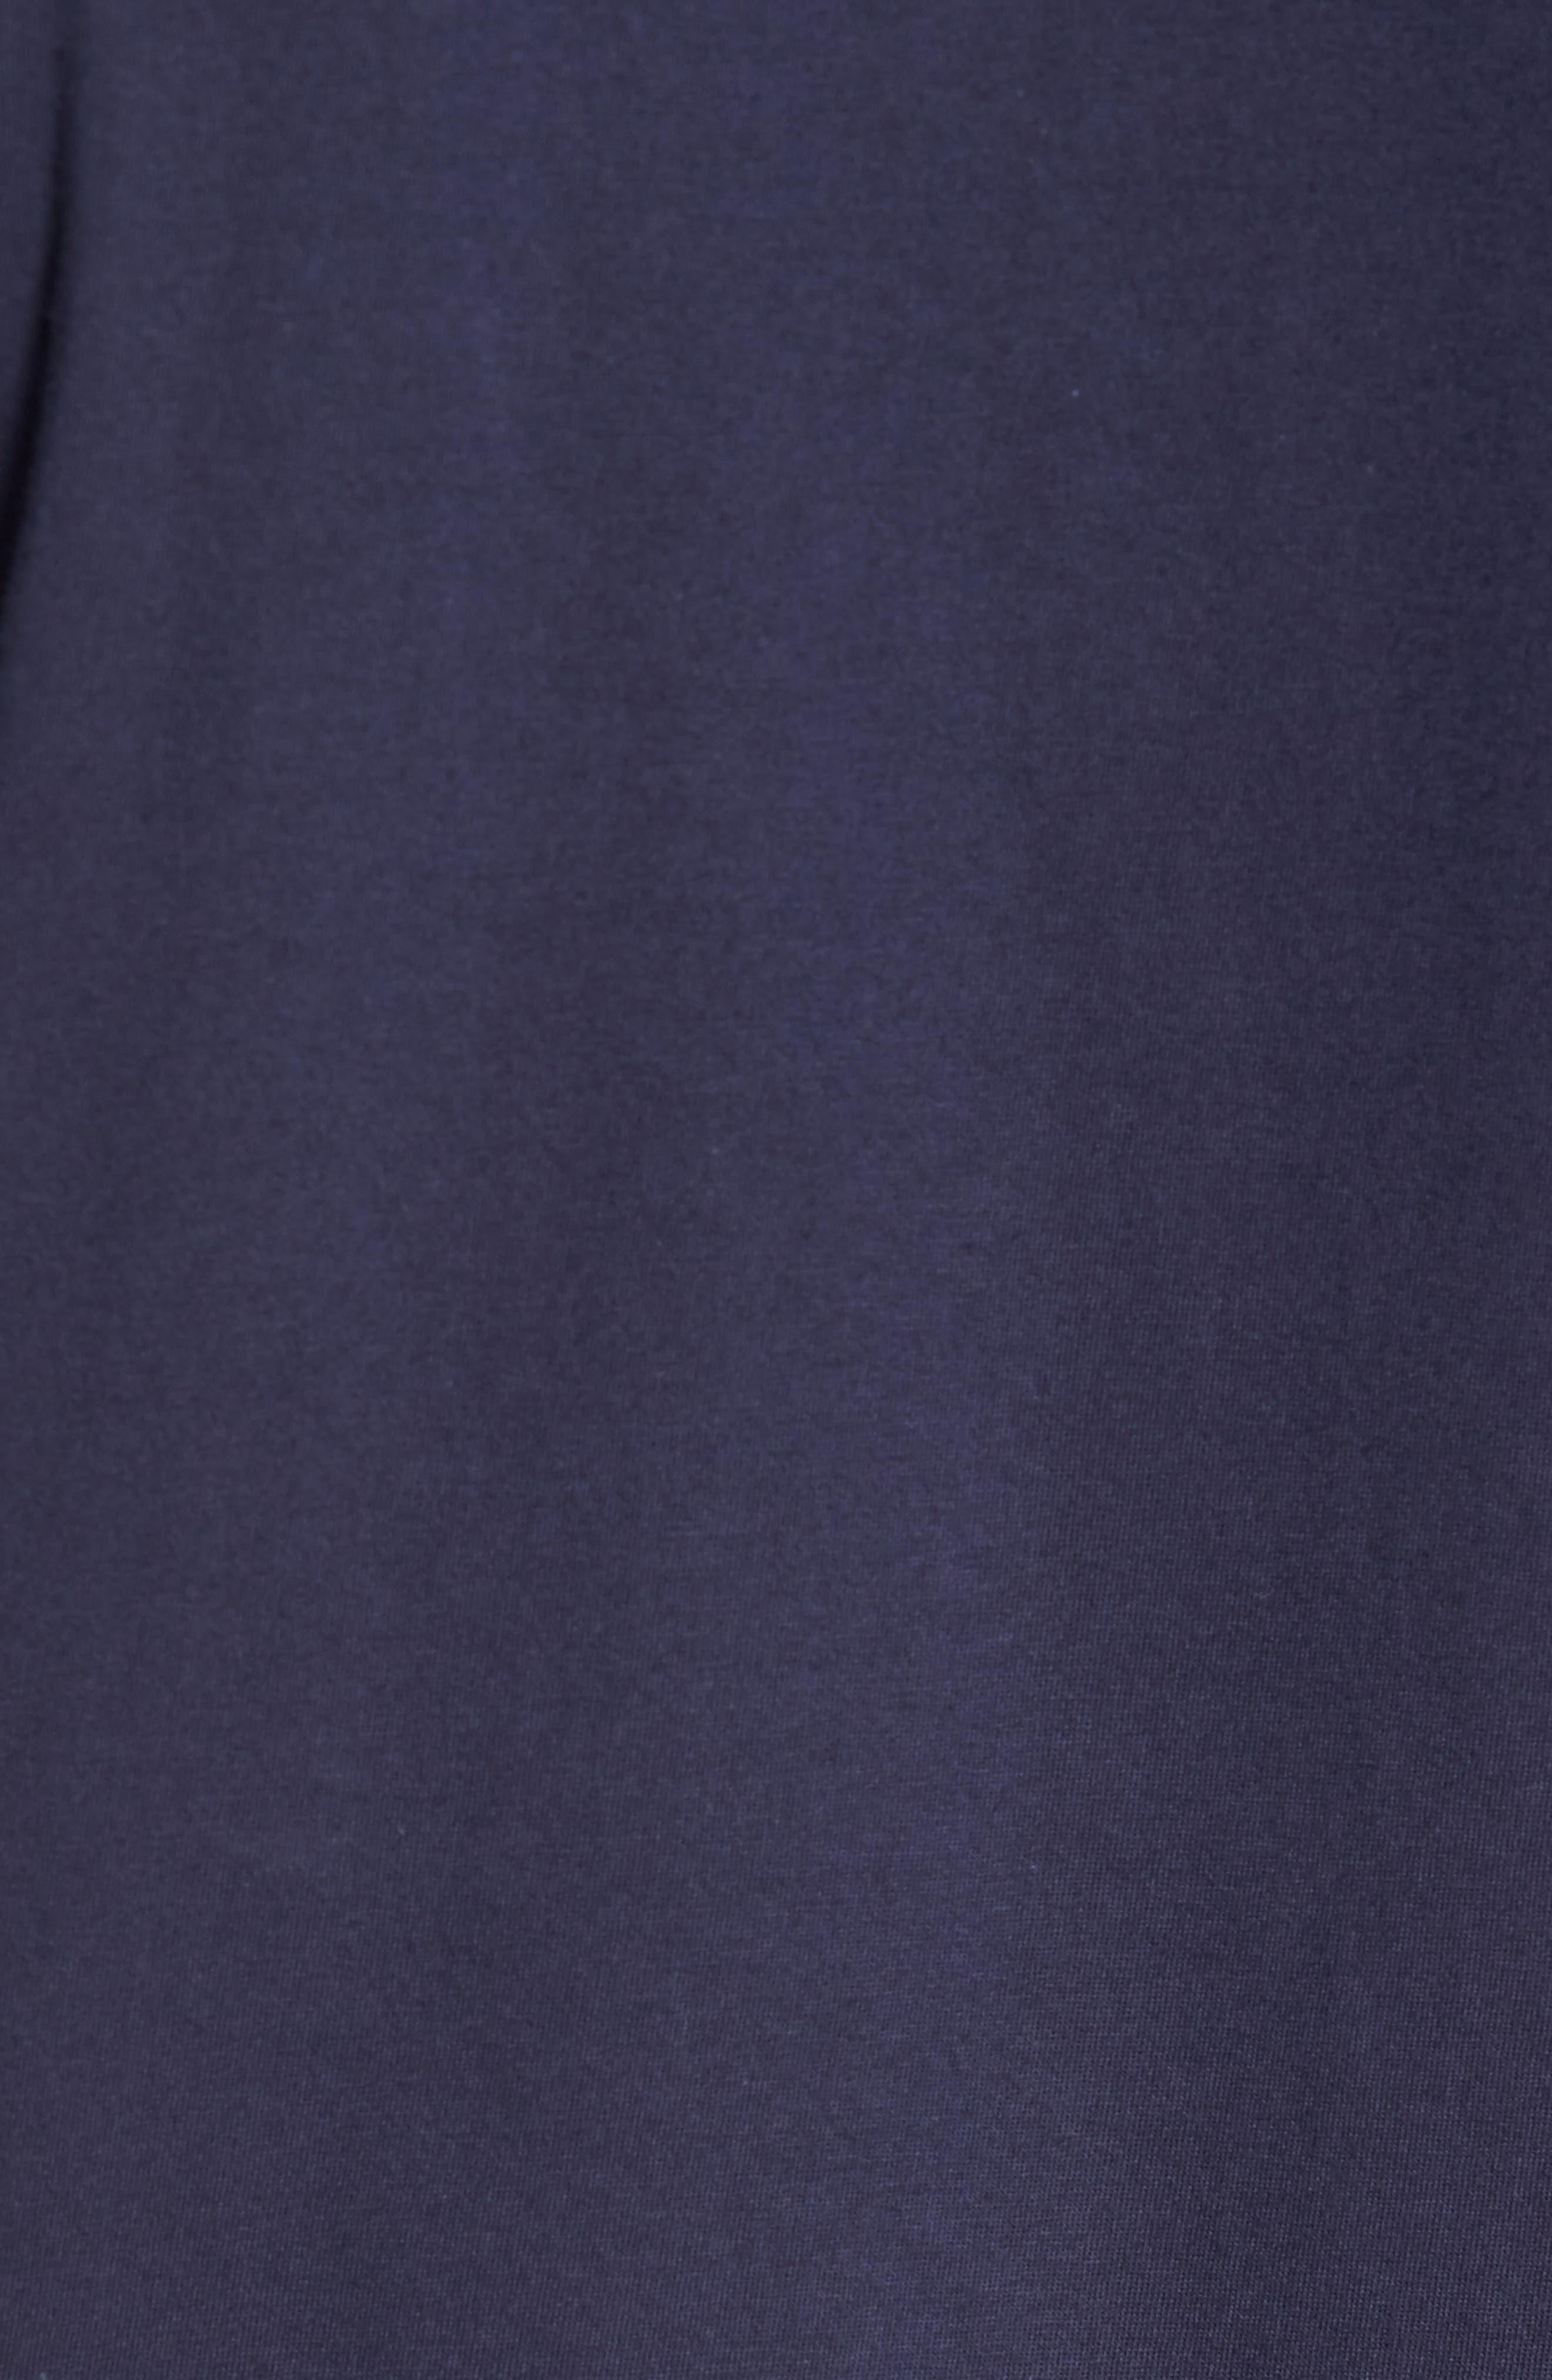 I'm So Hood T-Shirt,                             Alternate thumbnail 5, color,                             Navy Blue